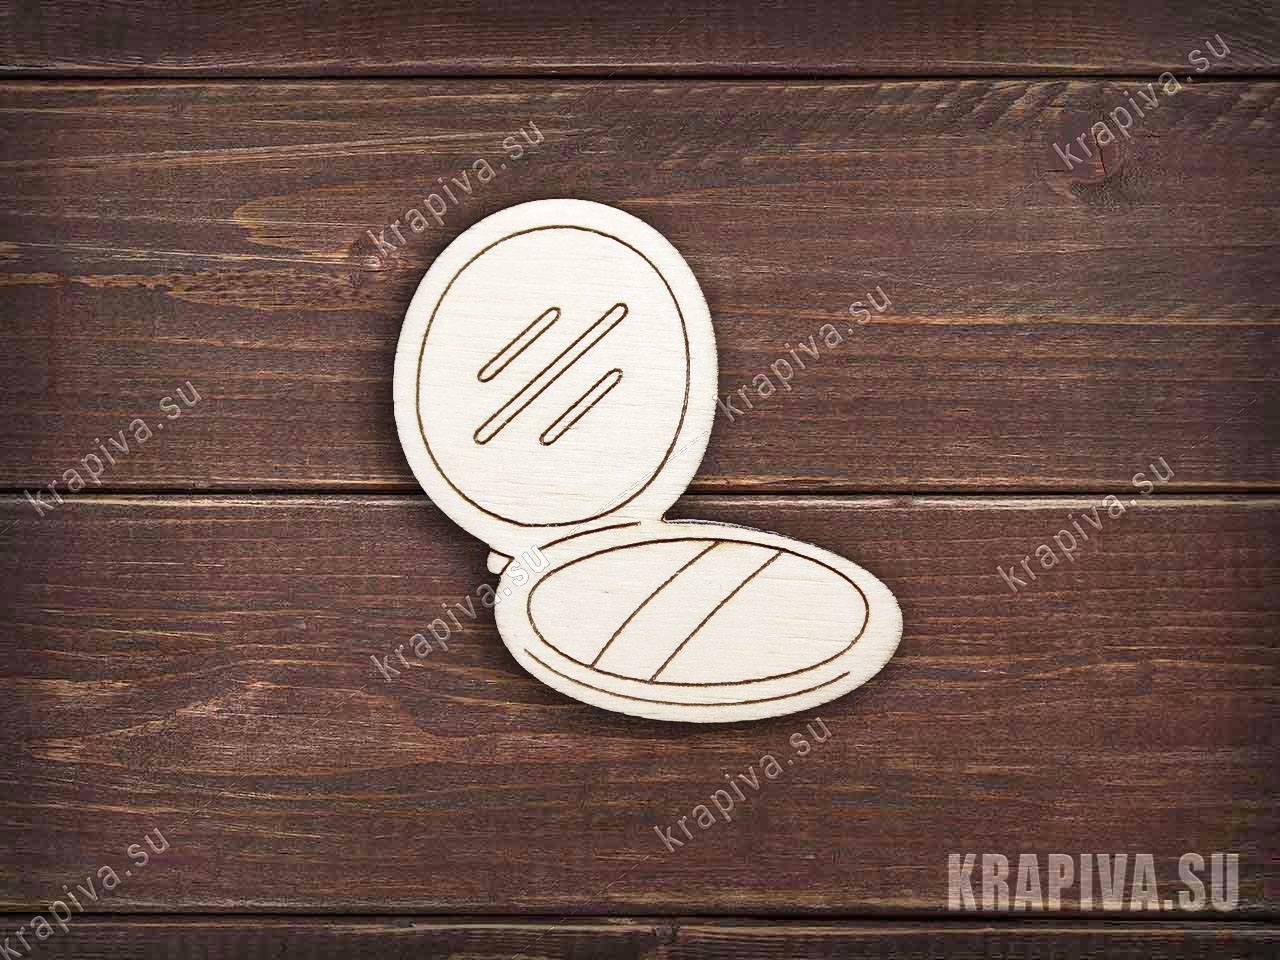 Пудреница заготовка значка за 35 руб. в магазине Крапива (krapiva.su) (фото)